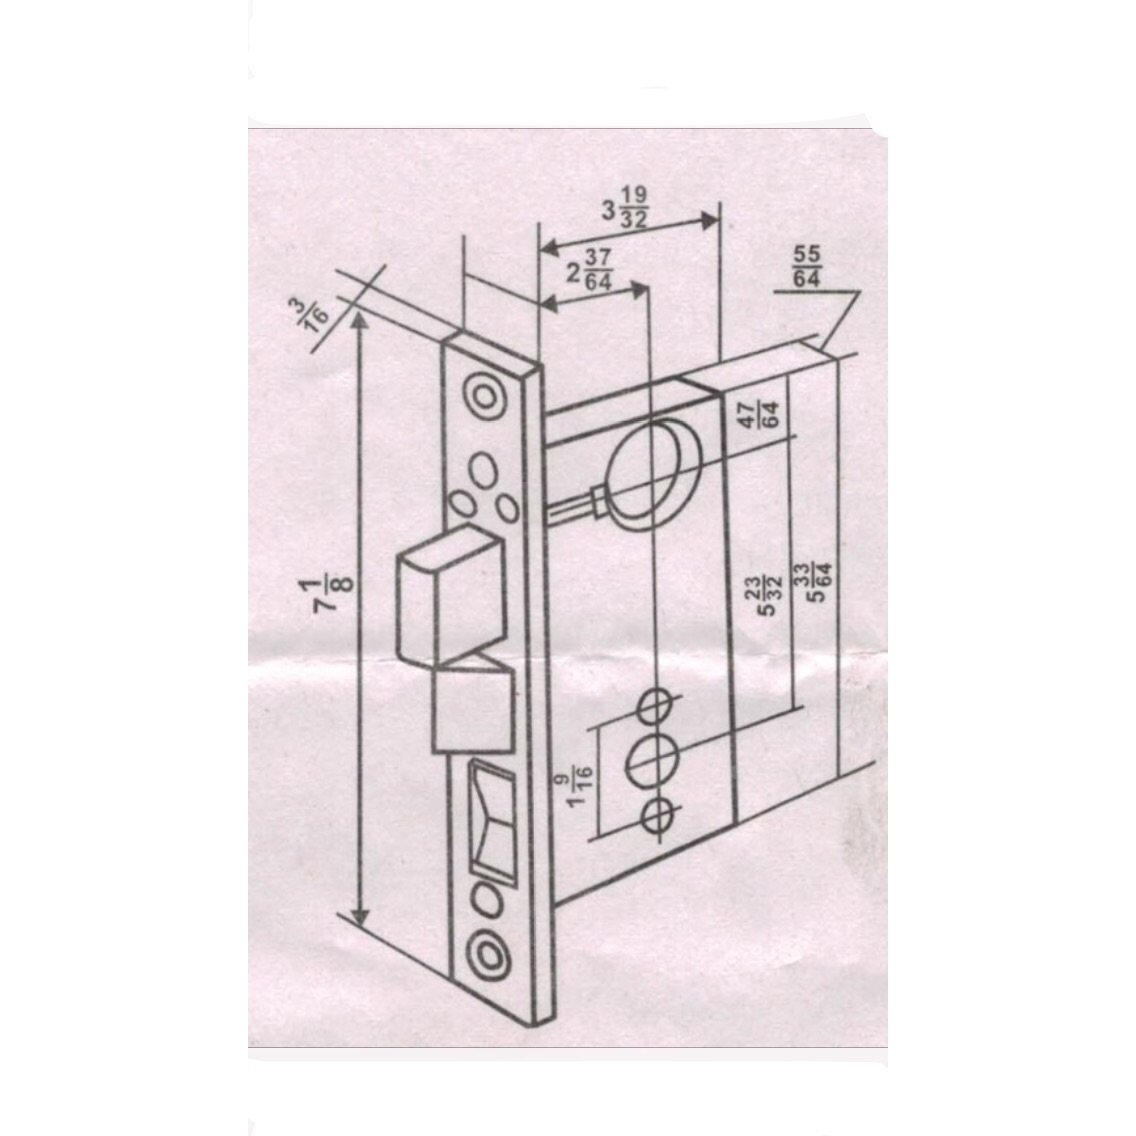 Maxtech Heavy Duty ORNAMENTAL Iron Gate Double Cylinder Mortise Lockset 2-1/2'' Backset 1''X 7-1/8'' Faceplate Polish Brass (Left Hand Reverse )